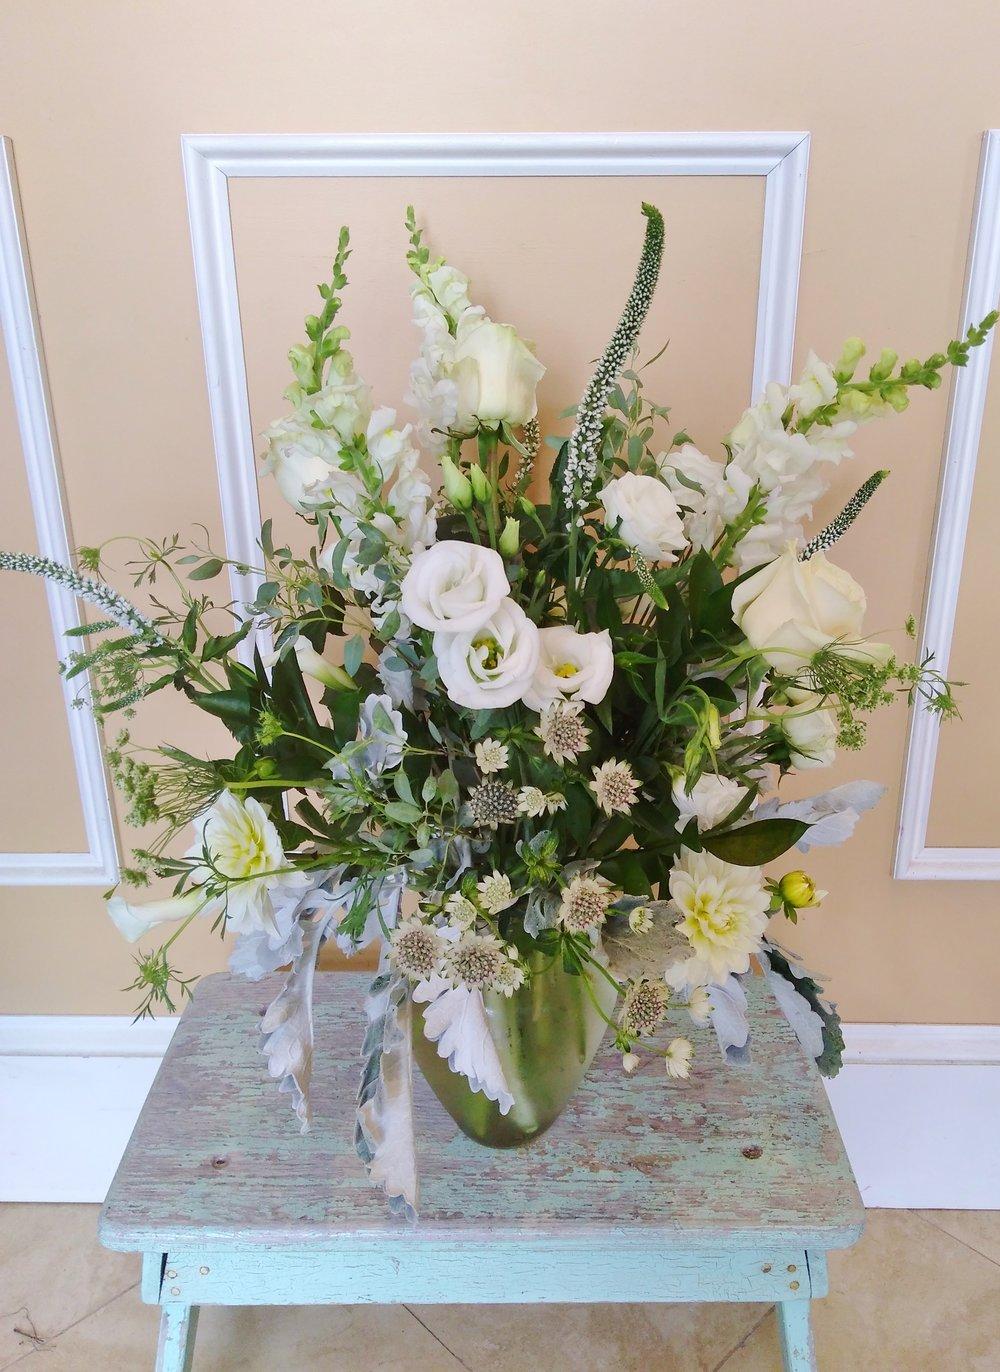 A9 $85-$150 Medium-tall classical style vase arrangement. $100 as shown.